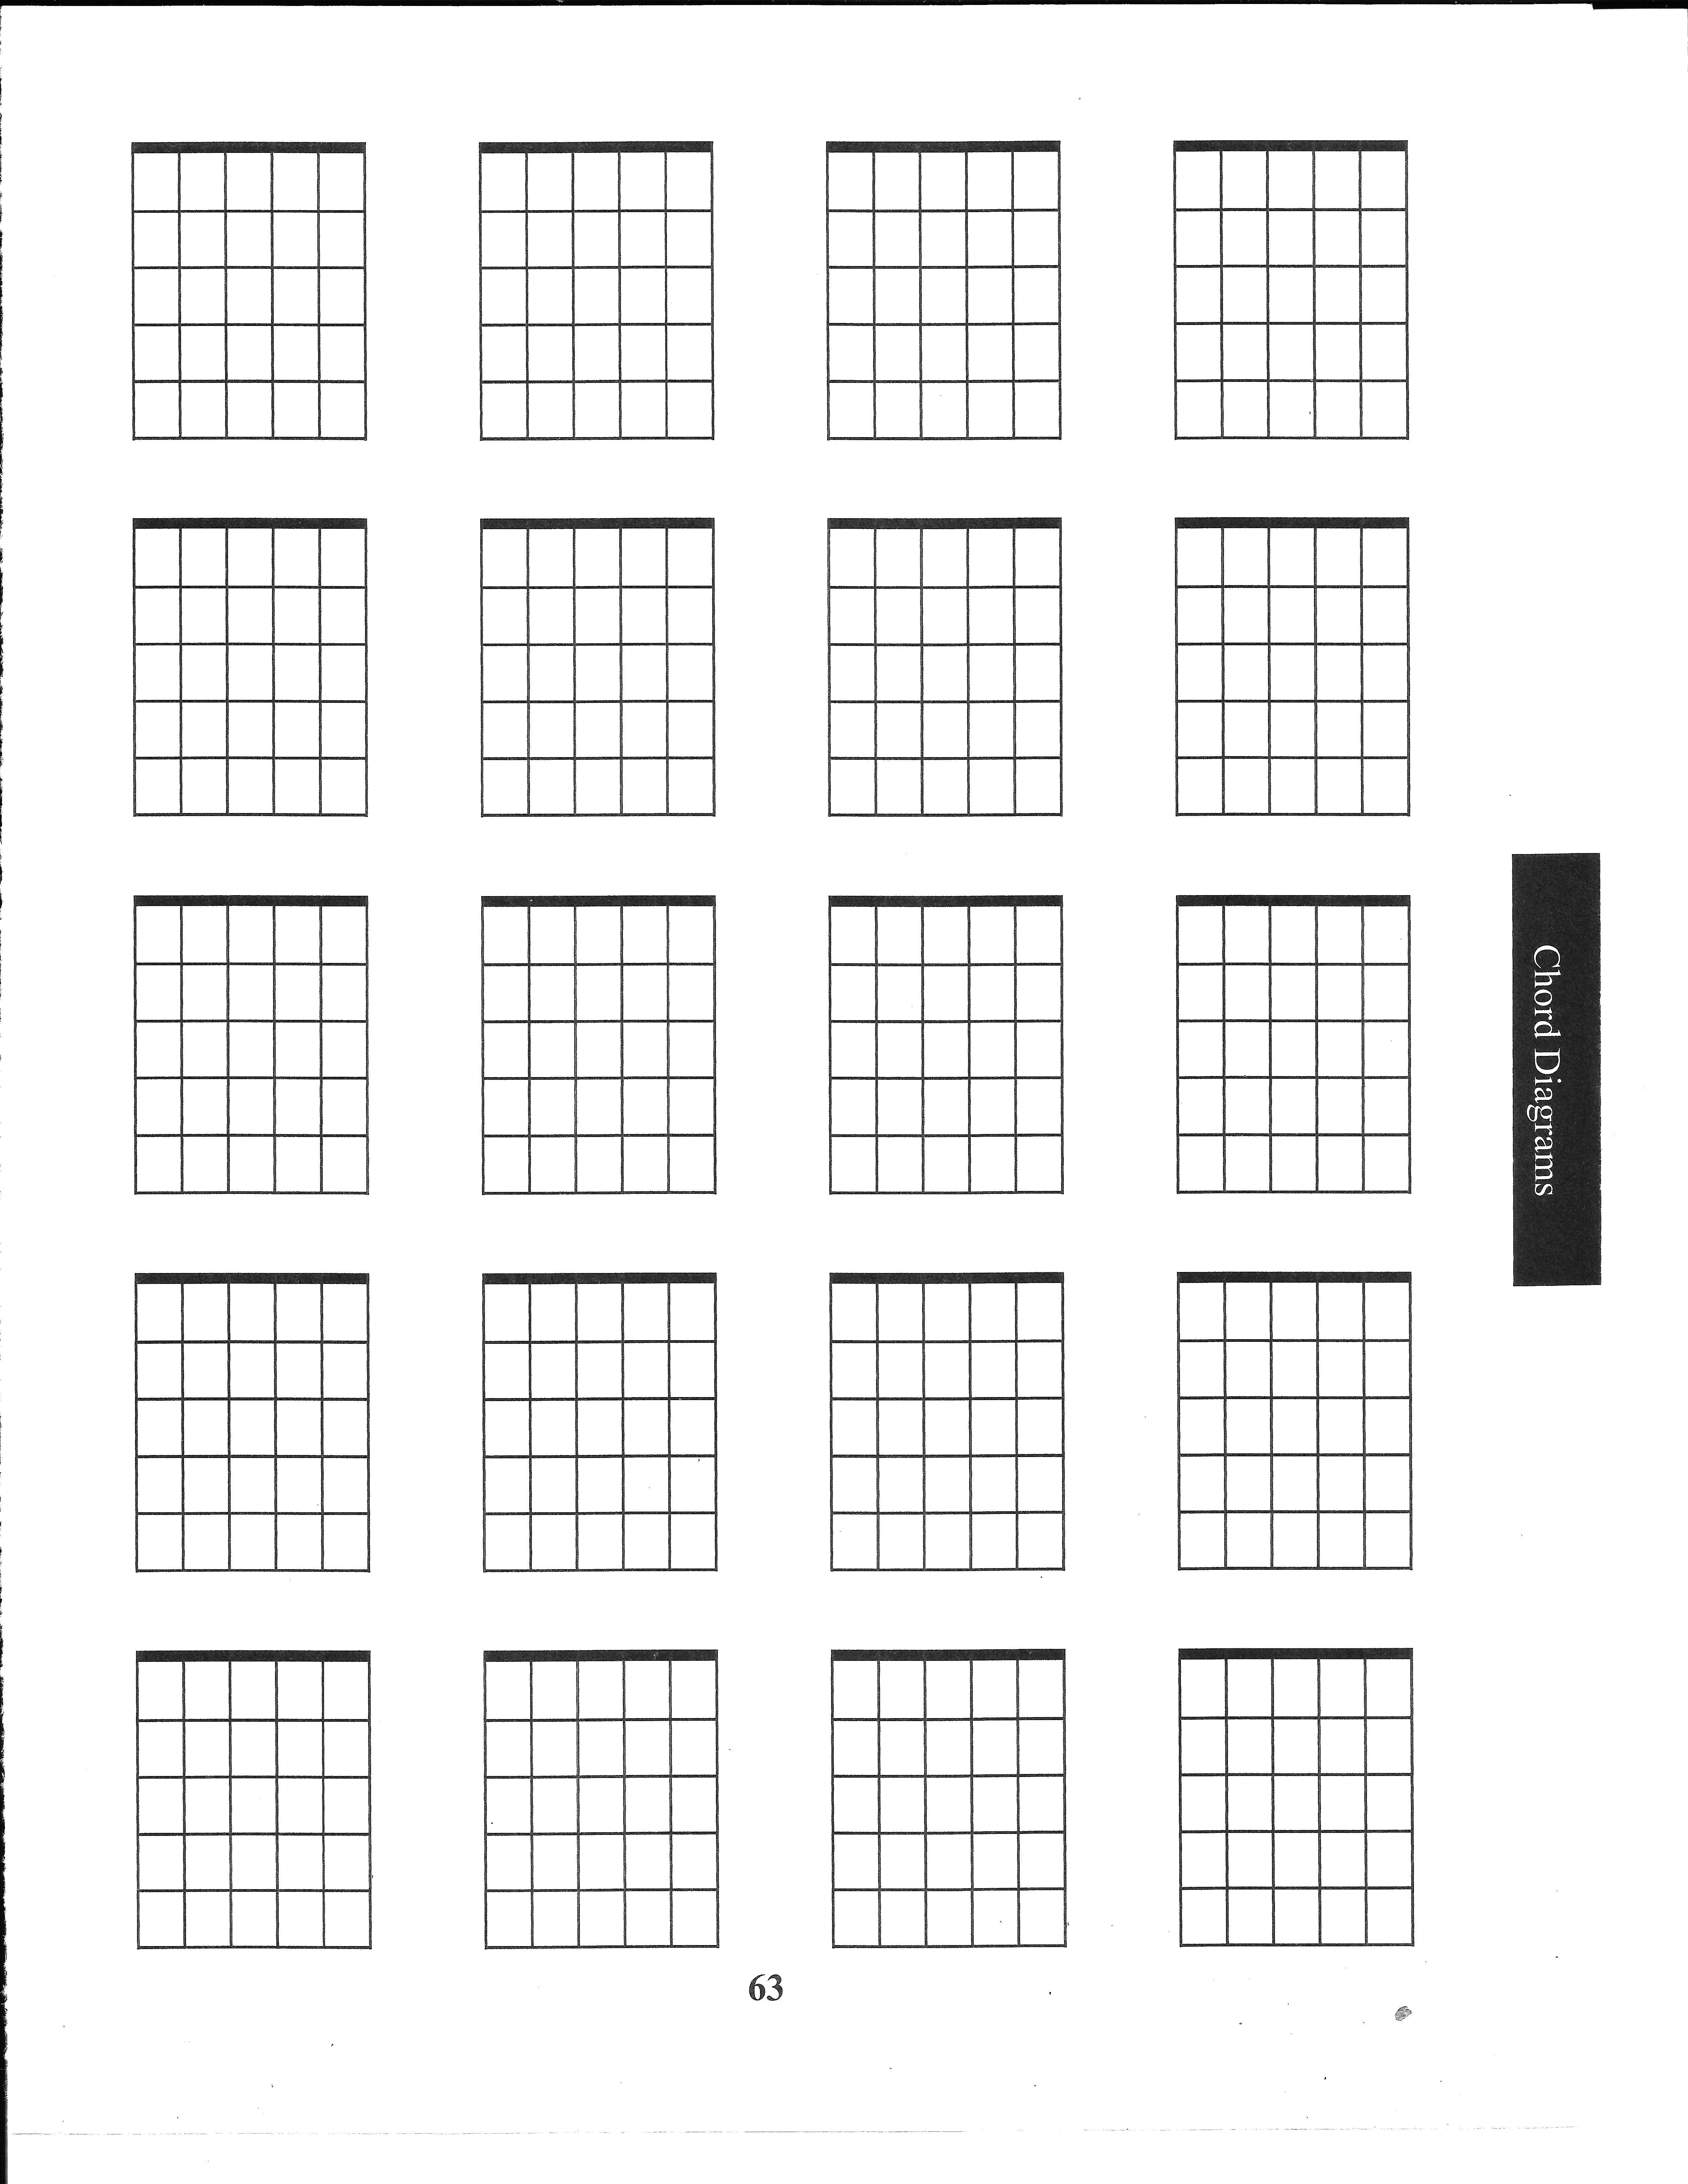 blank chord diagram sheet for guitar. | guitar | pinterest | guitar